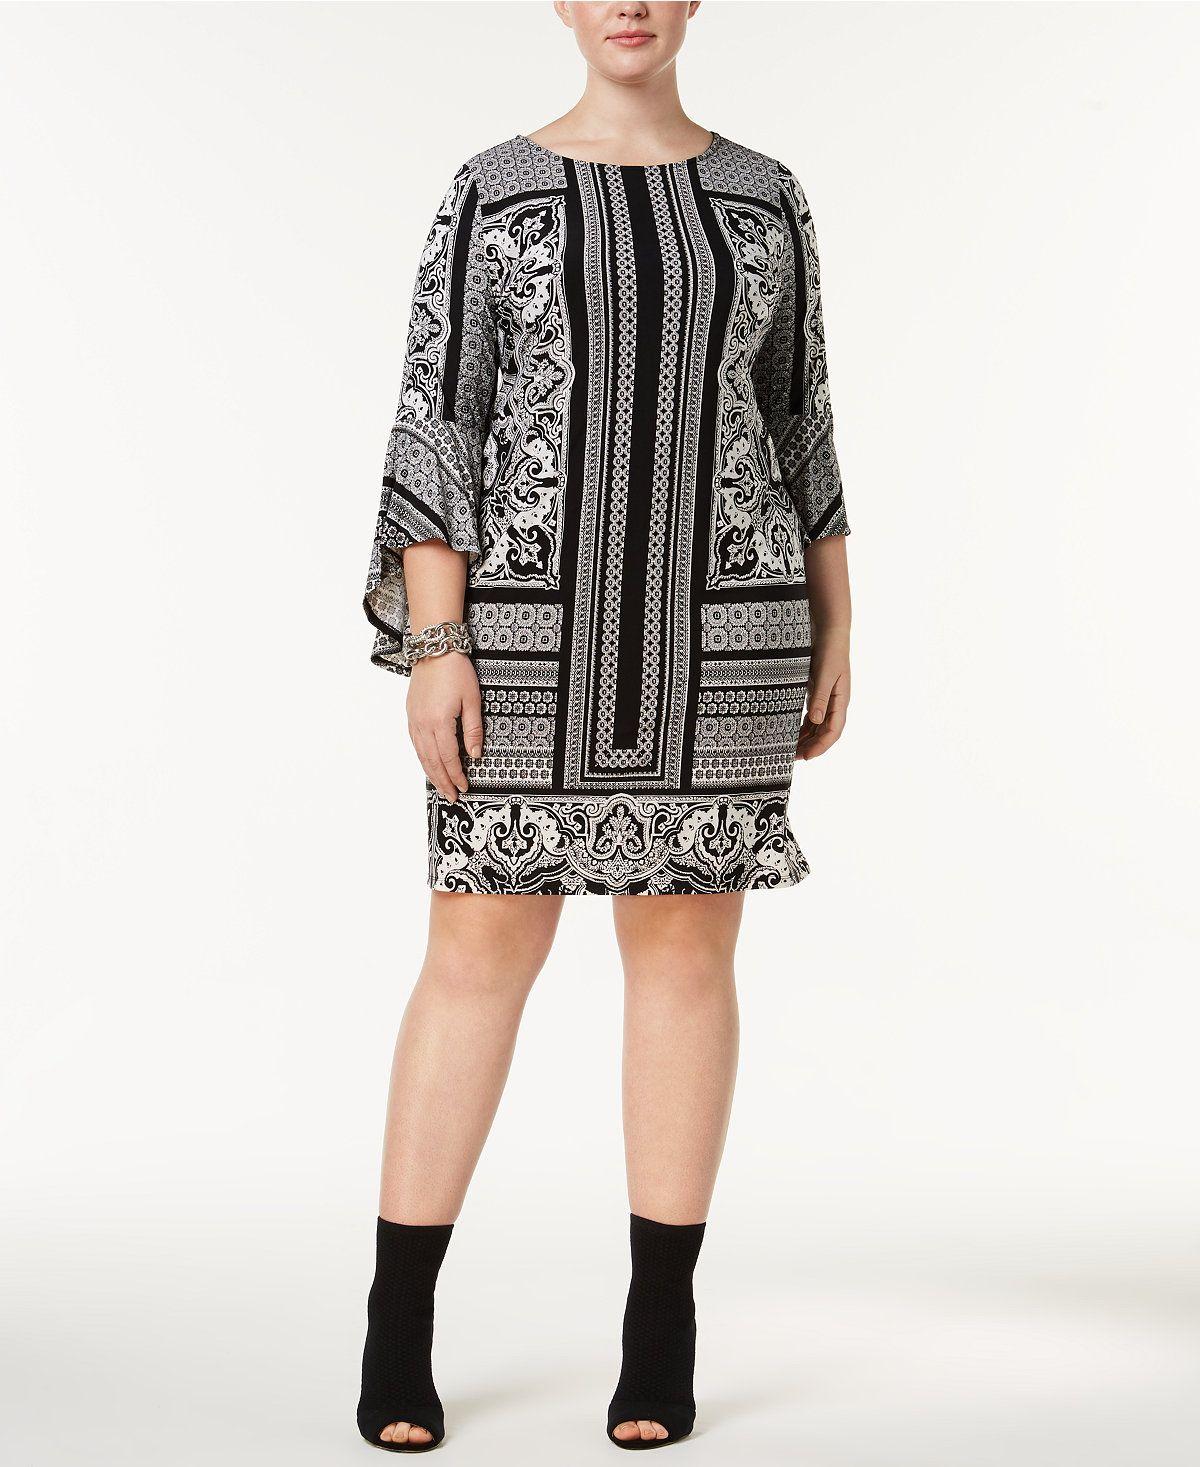 09f4f38b96c9 INC International Concepts Plus Size Printed Shift Dress, Created for  Macy's - Dresses - Plus Sizes - Macy's